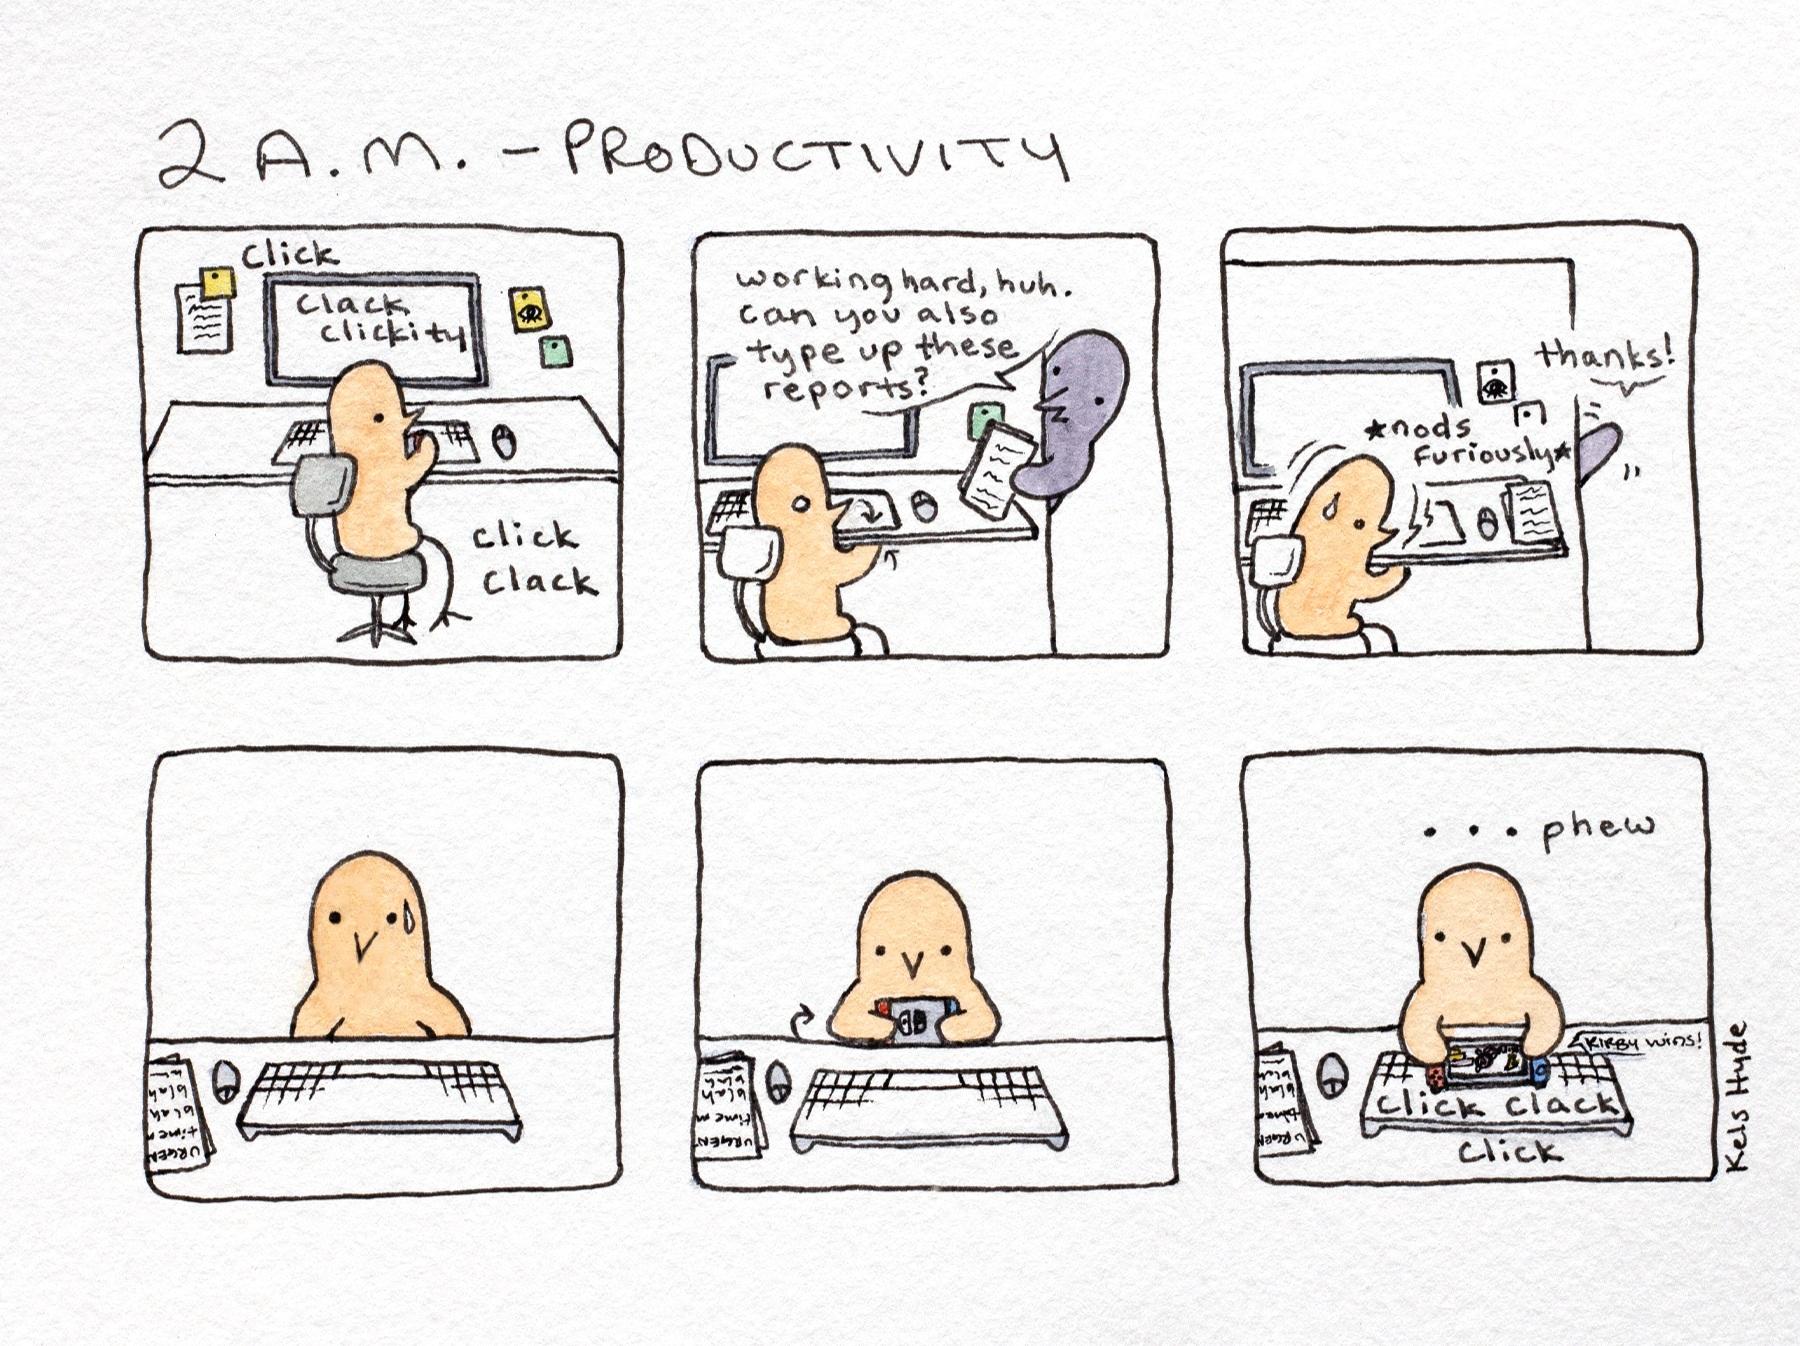 birb-productivity.jpg